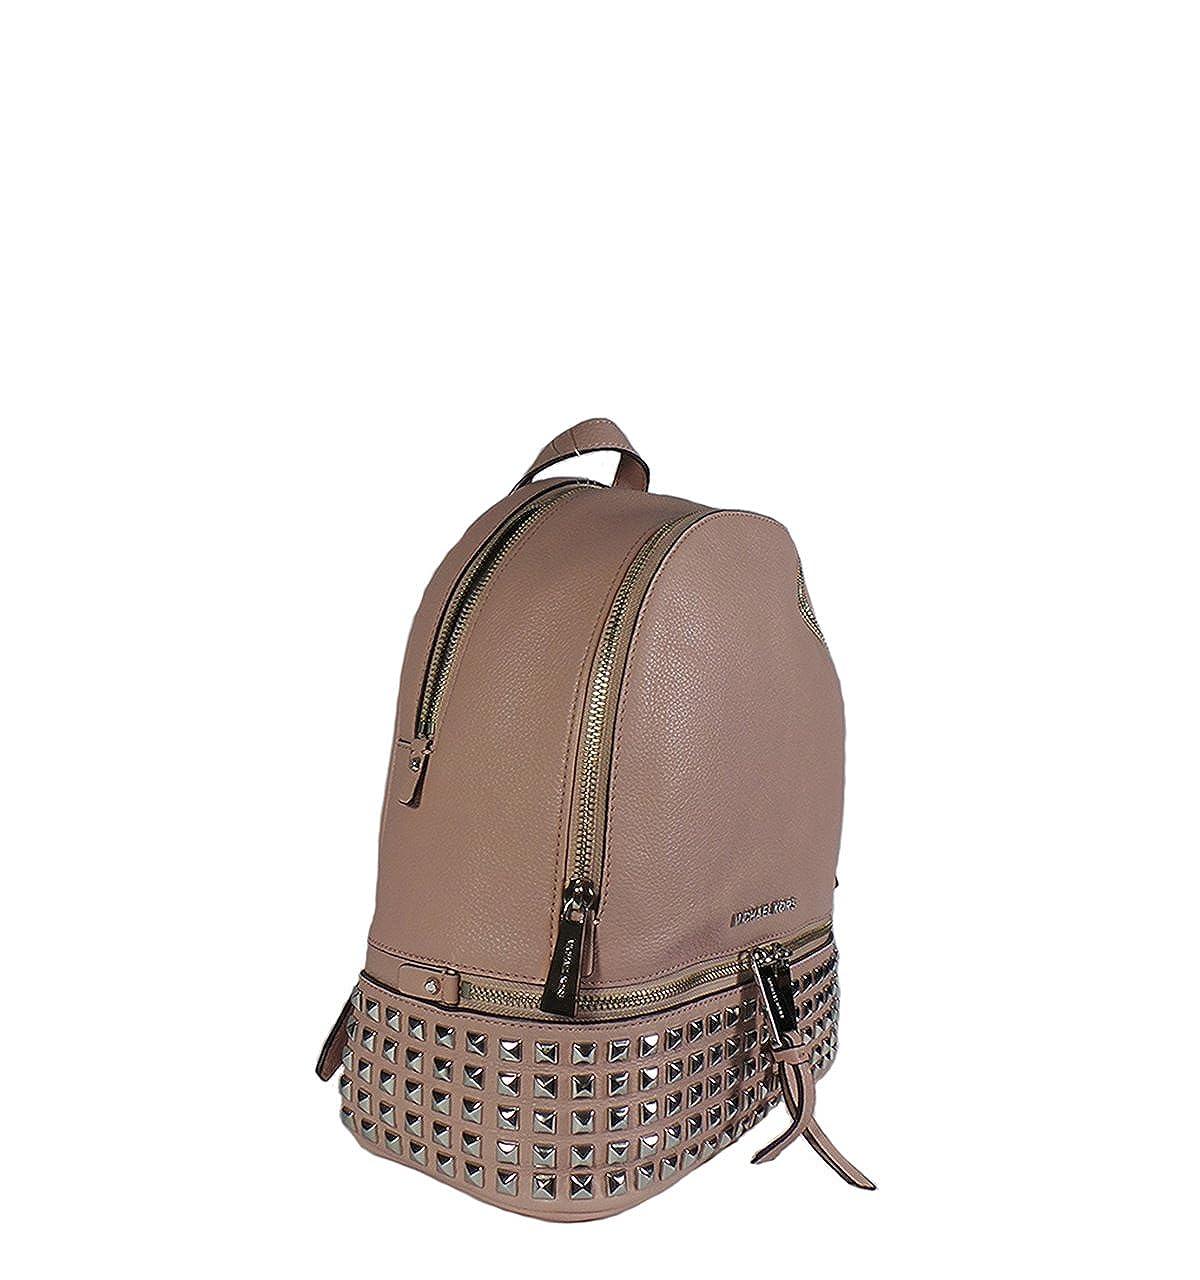 2bb39b4bd98d Amazon.com: Michael Kors Rhea Small Studded Leather Backpack Ballet: Shoes